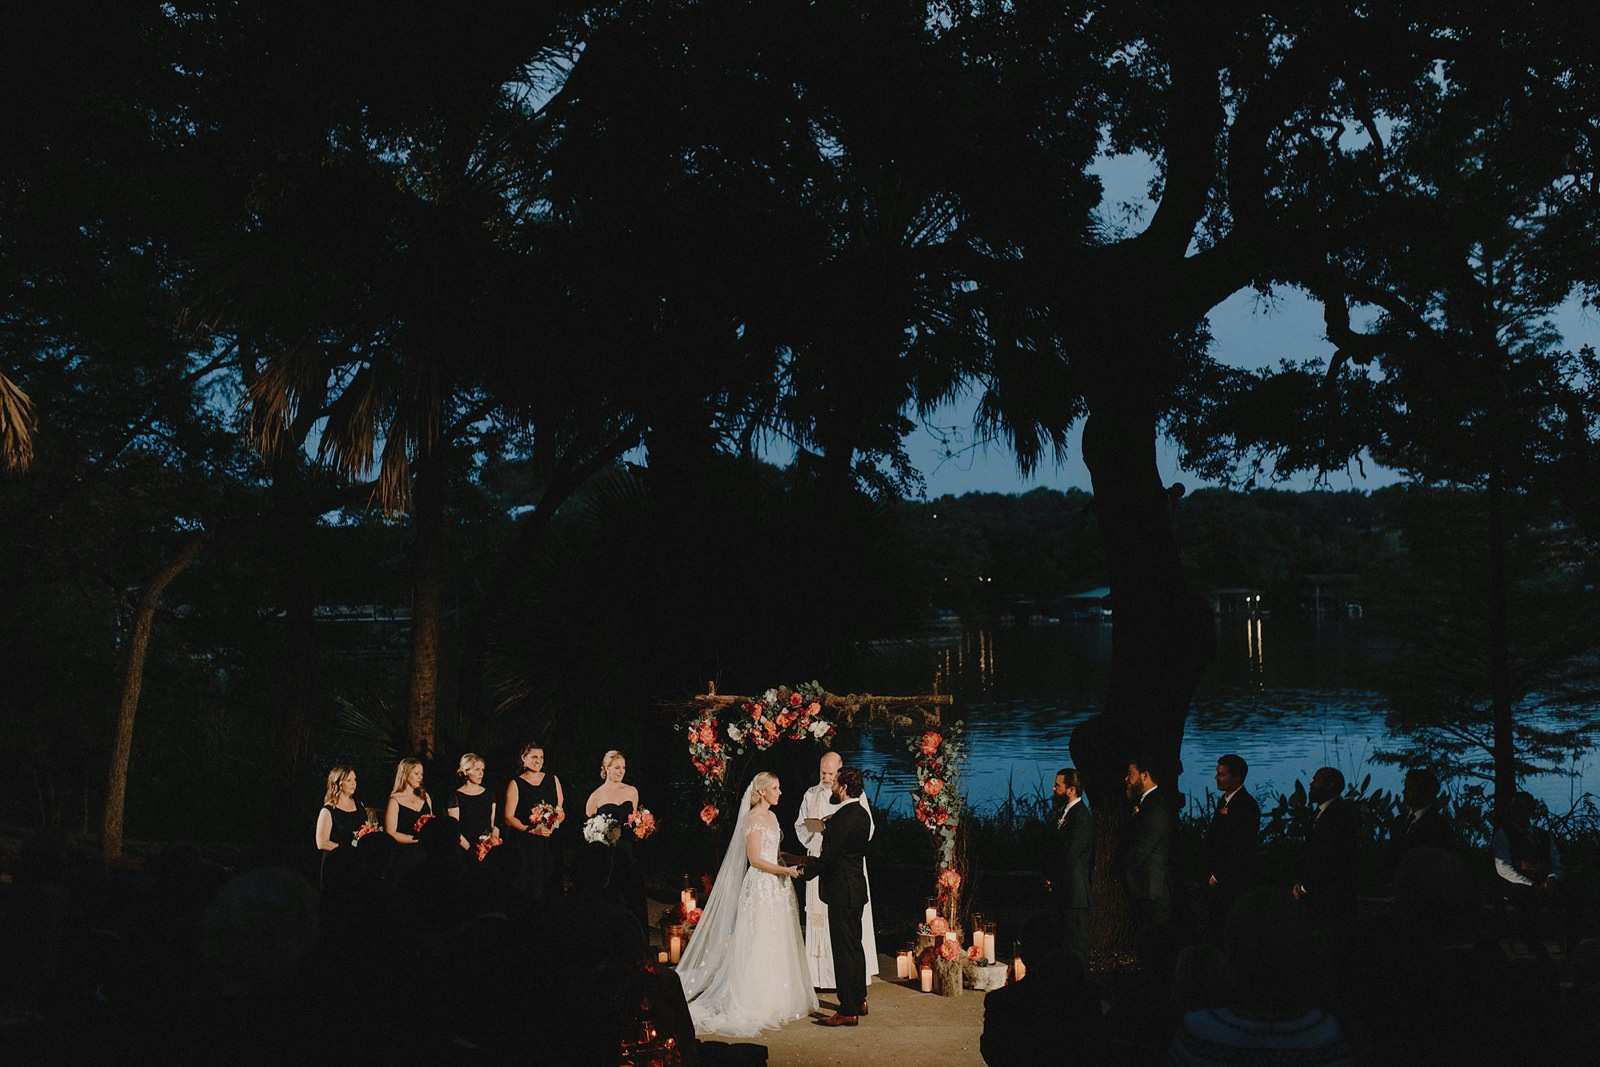 Nighttime amphitheatre wedding ceremony at Austin venue Laguna Gloria